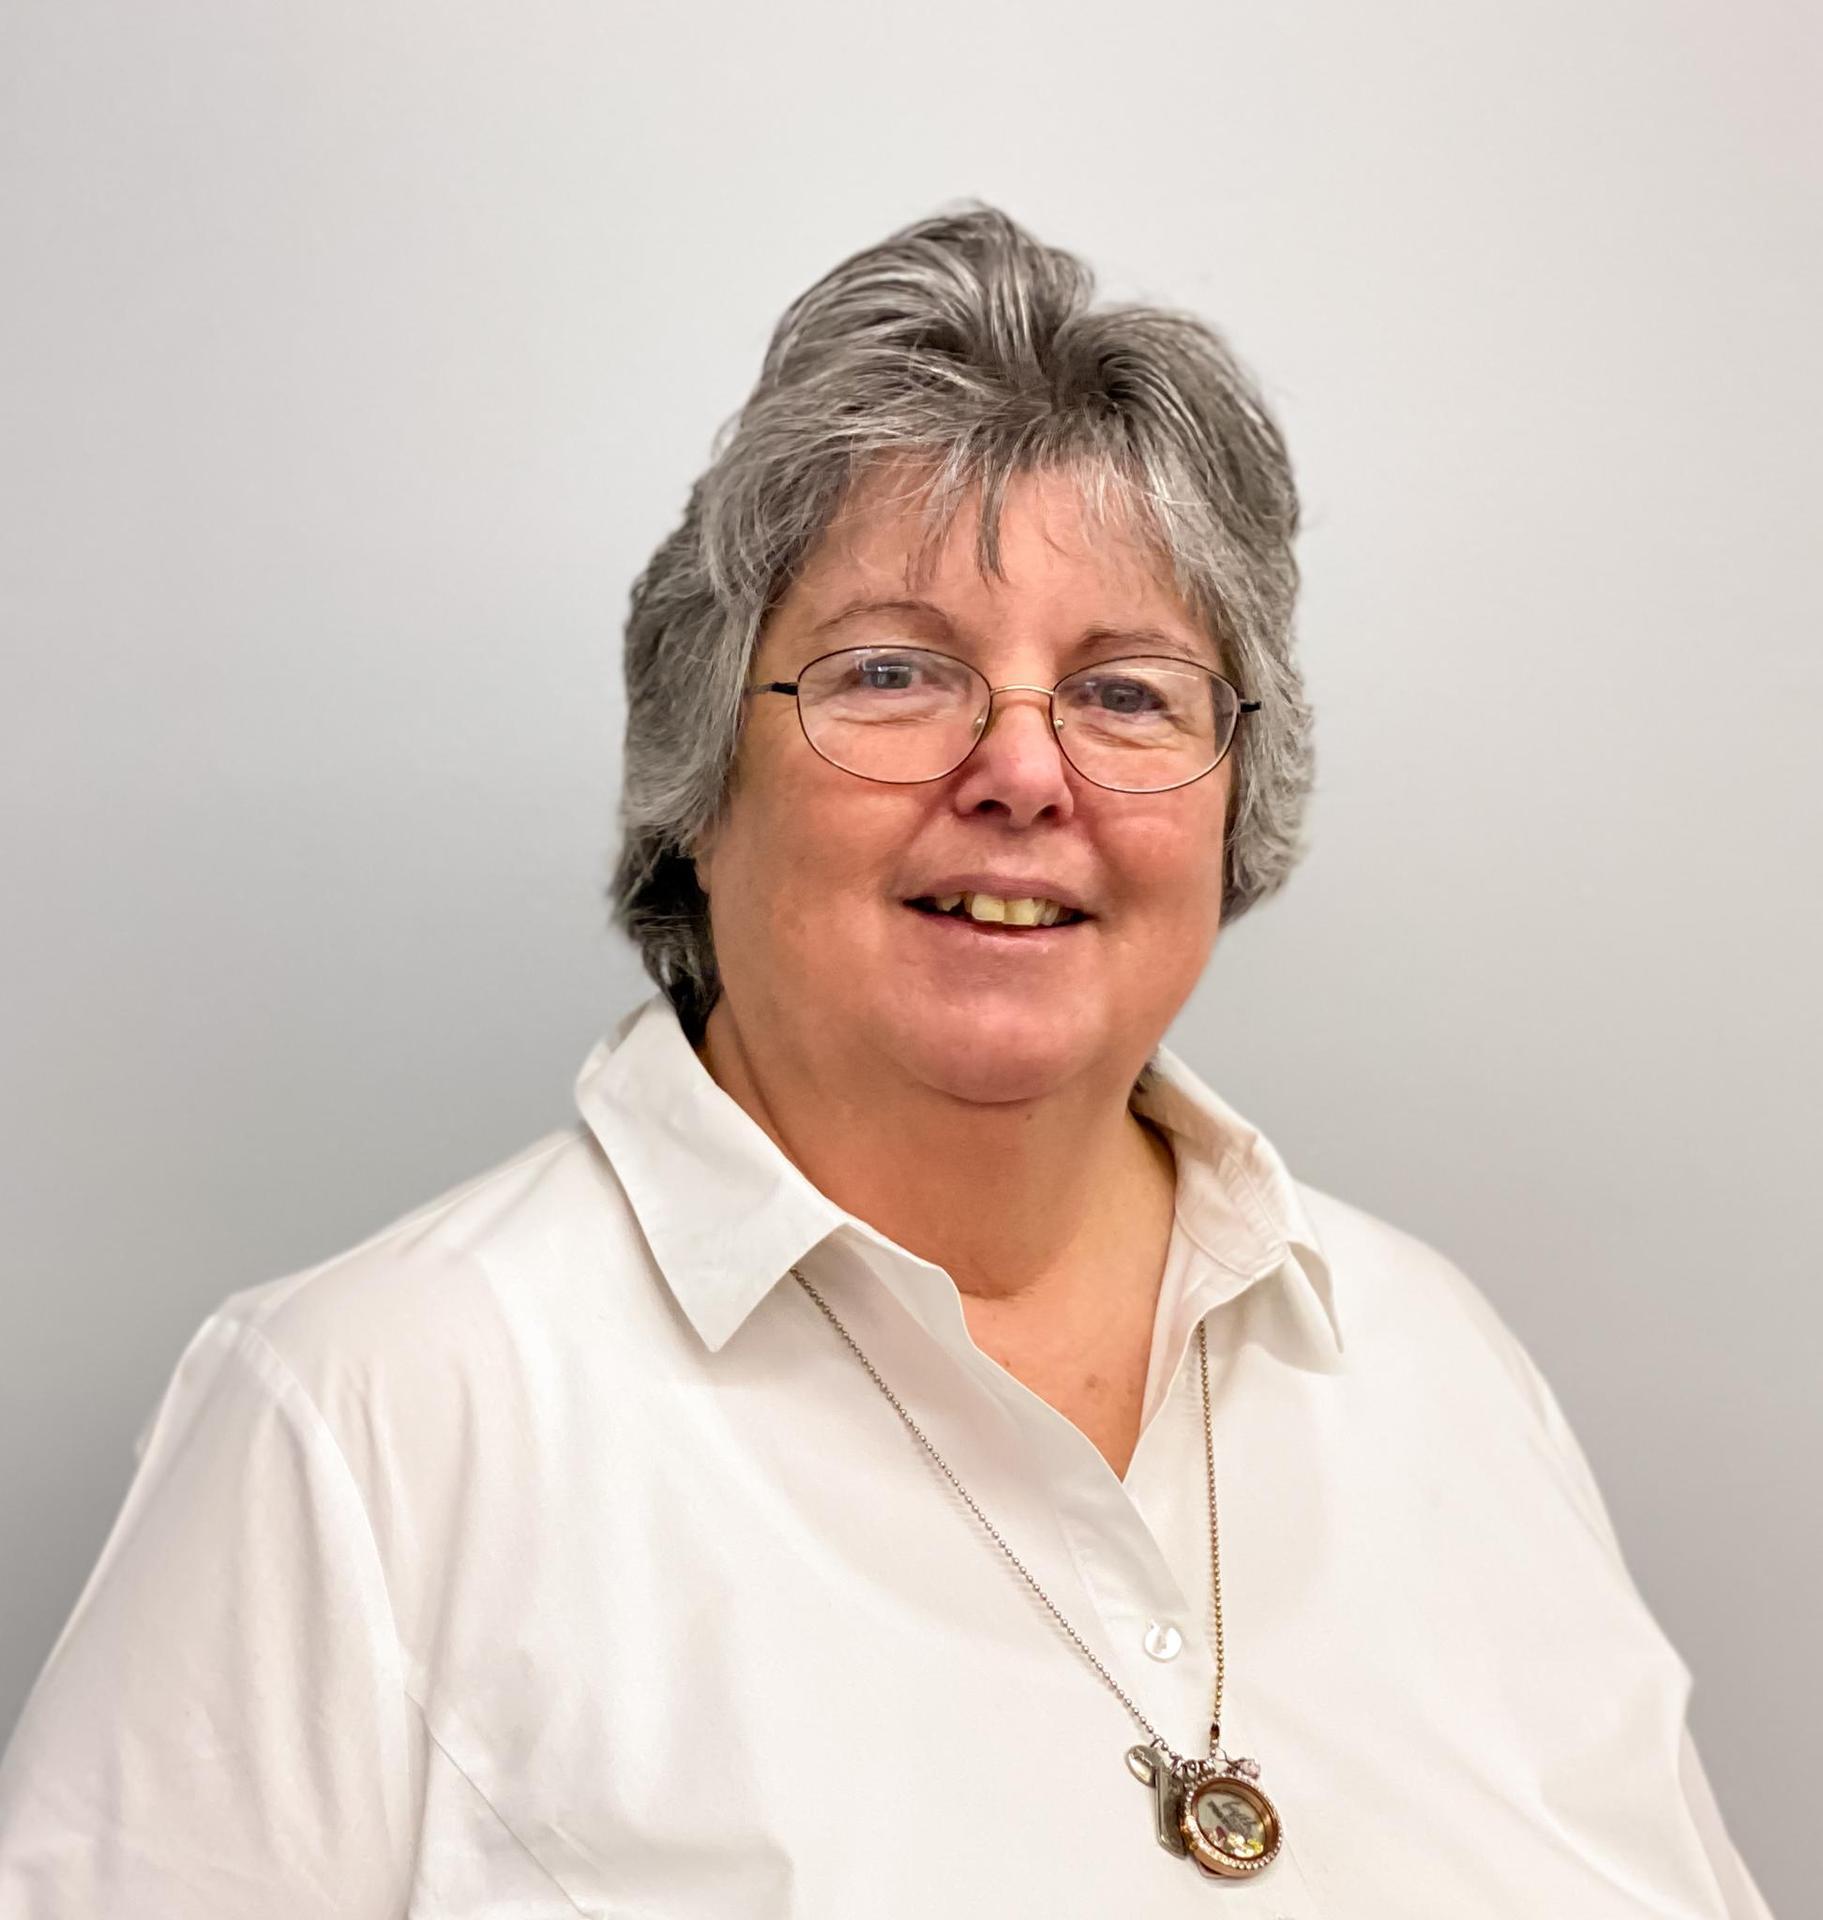 Eugenia Snyder, Professional Development Assistant